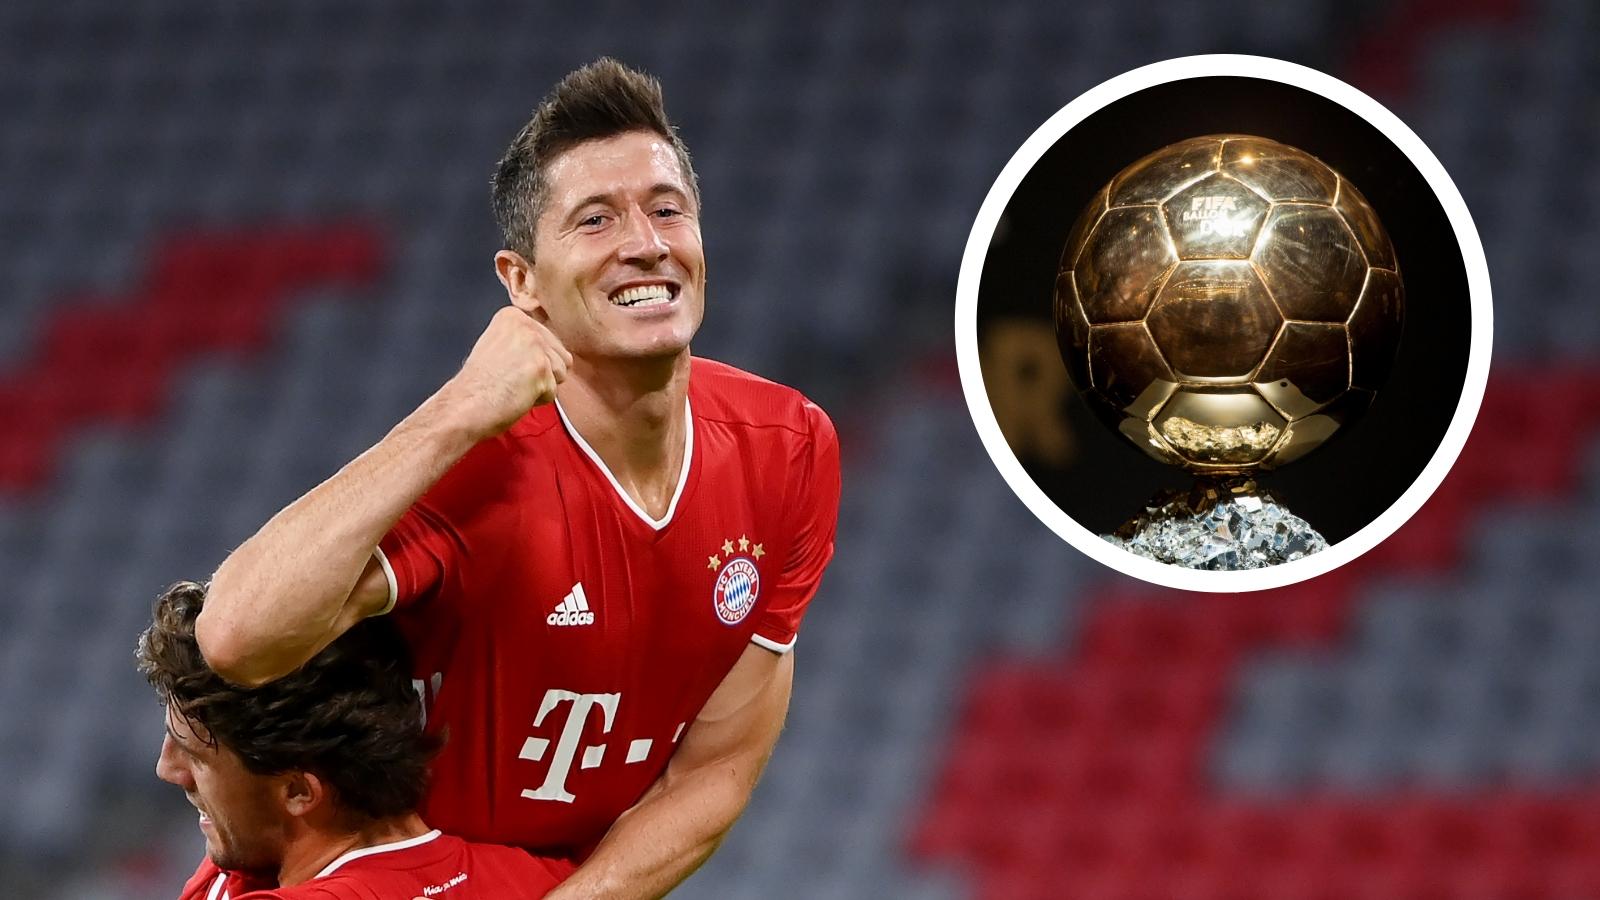 Lewandowski should start a petition over Ballon d'Or cancellation - Ferdinand